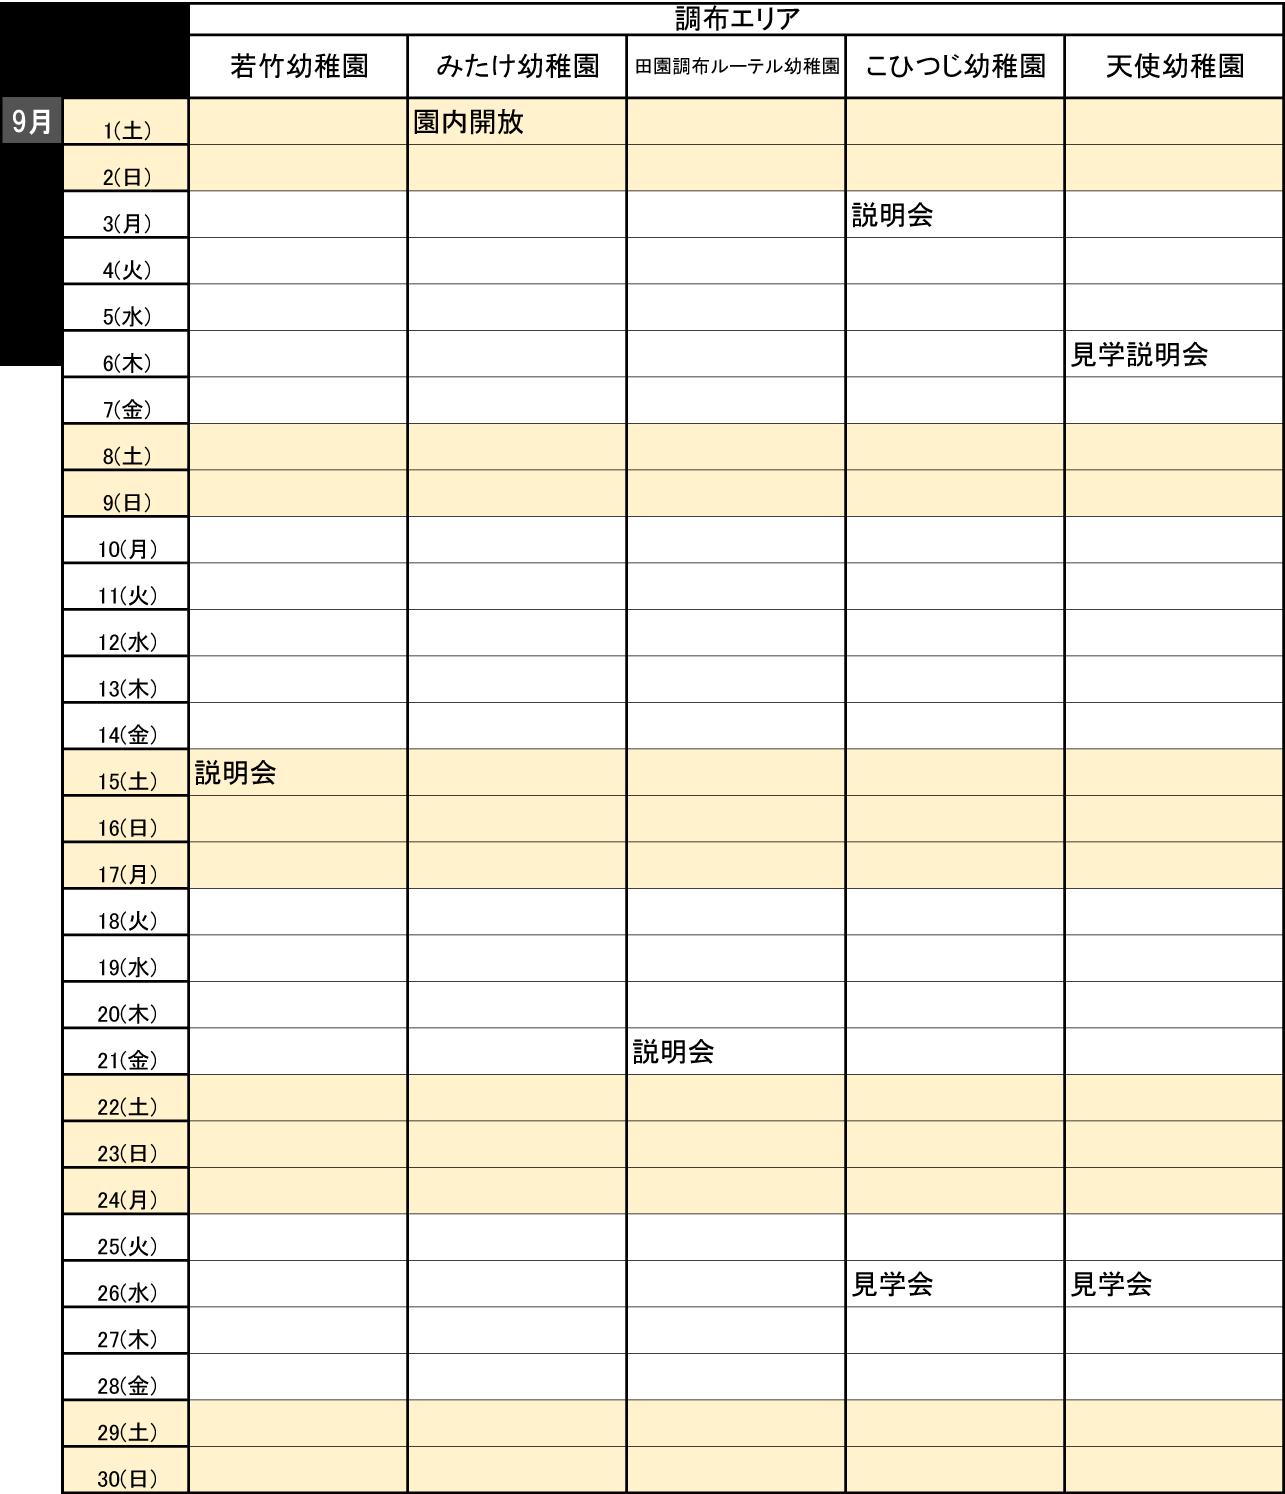 大田区私立幼稚園見学会スケジュール